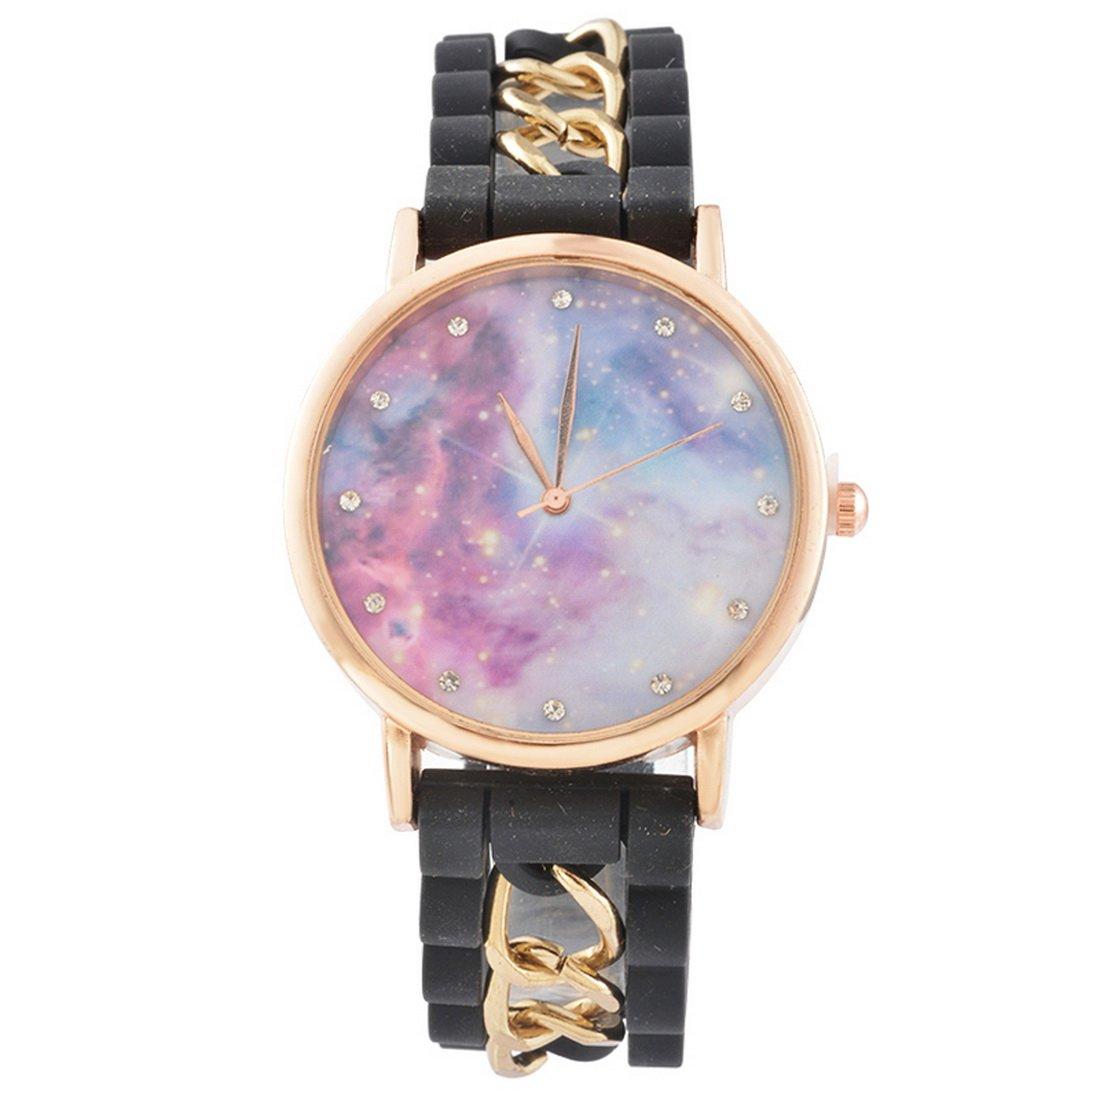 MJARTORIA-Damen-Galaxy-Motiv-Armbanduhr-Elegant-Silikonarmband-mit-Strass-Damenuhr-Analog-Quarz-Uhr-Schwarz